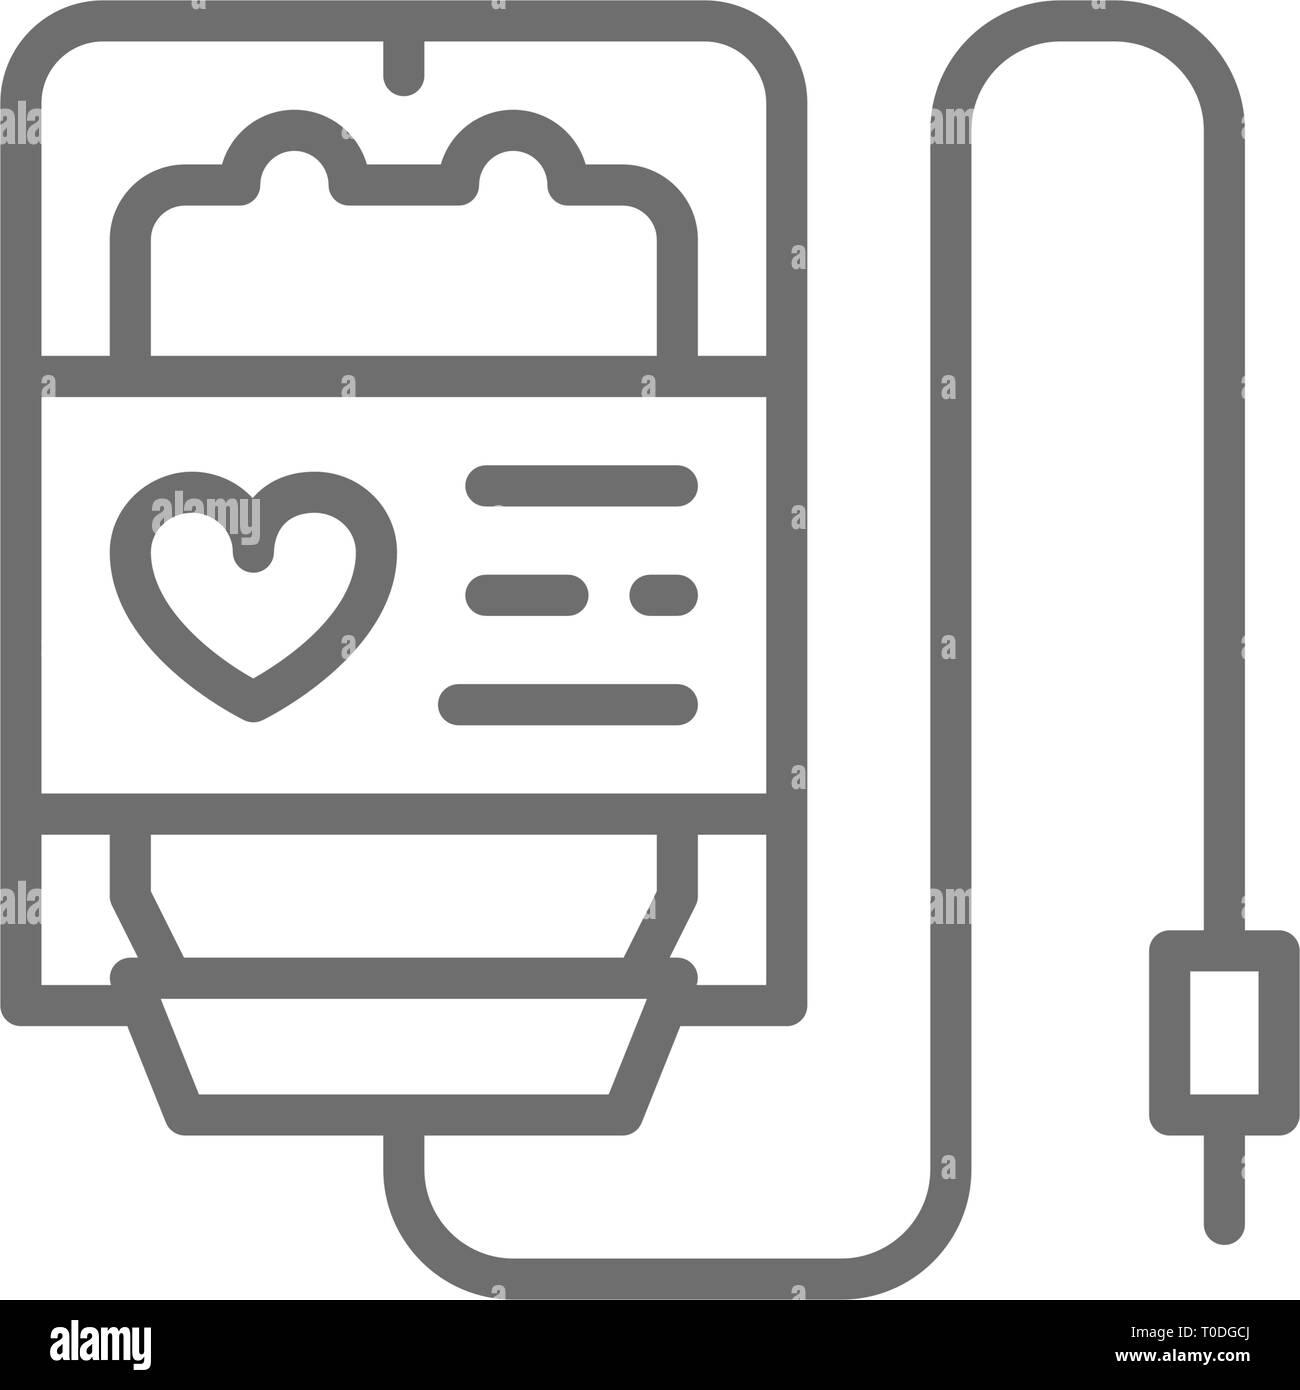 Blood donation, transfusion, volunteering, charity line icon. - Stock Image